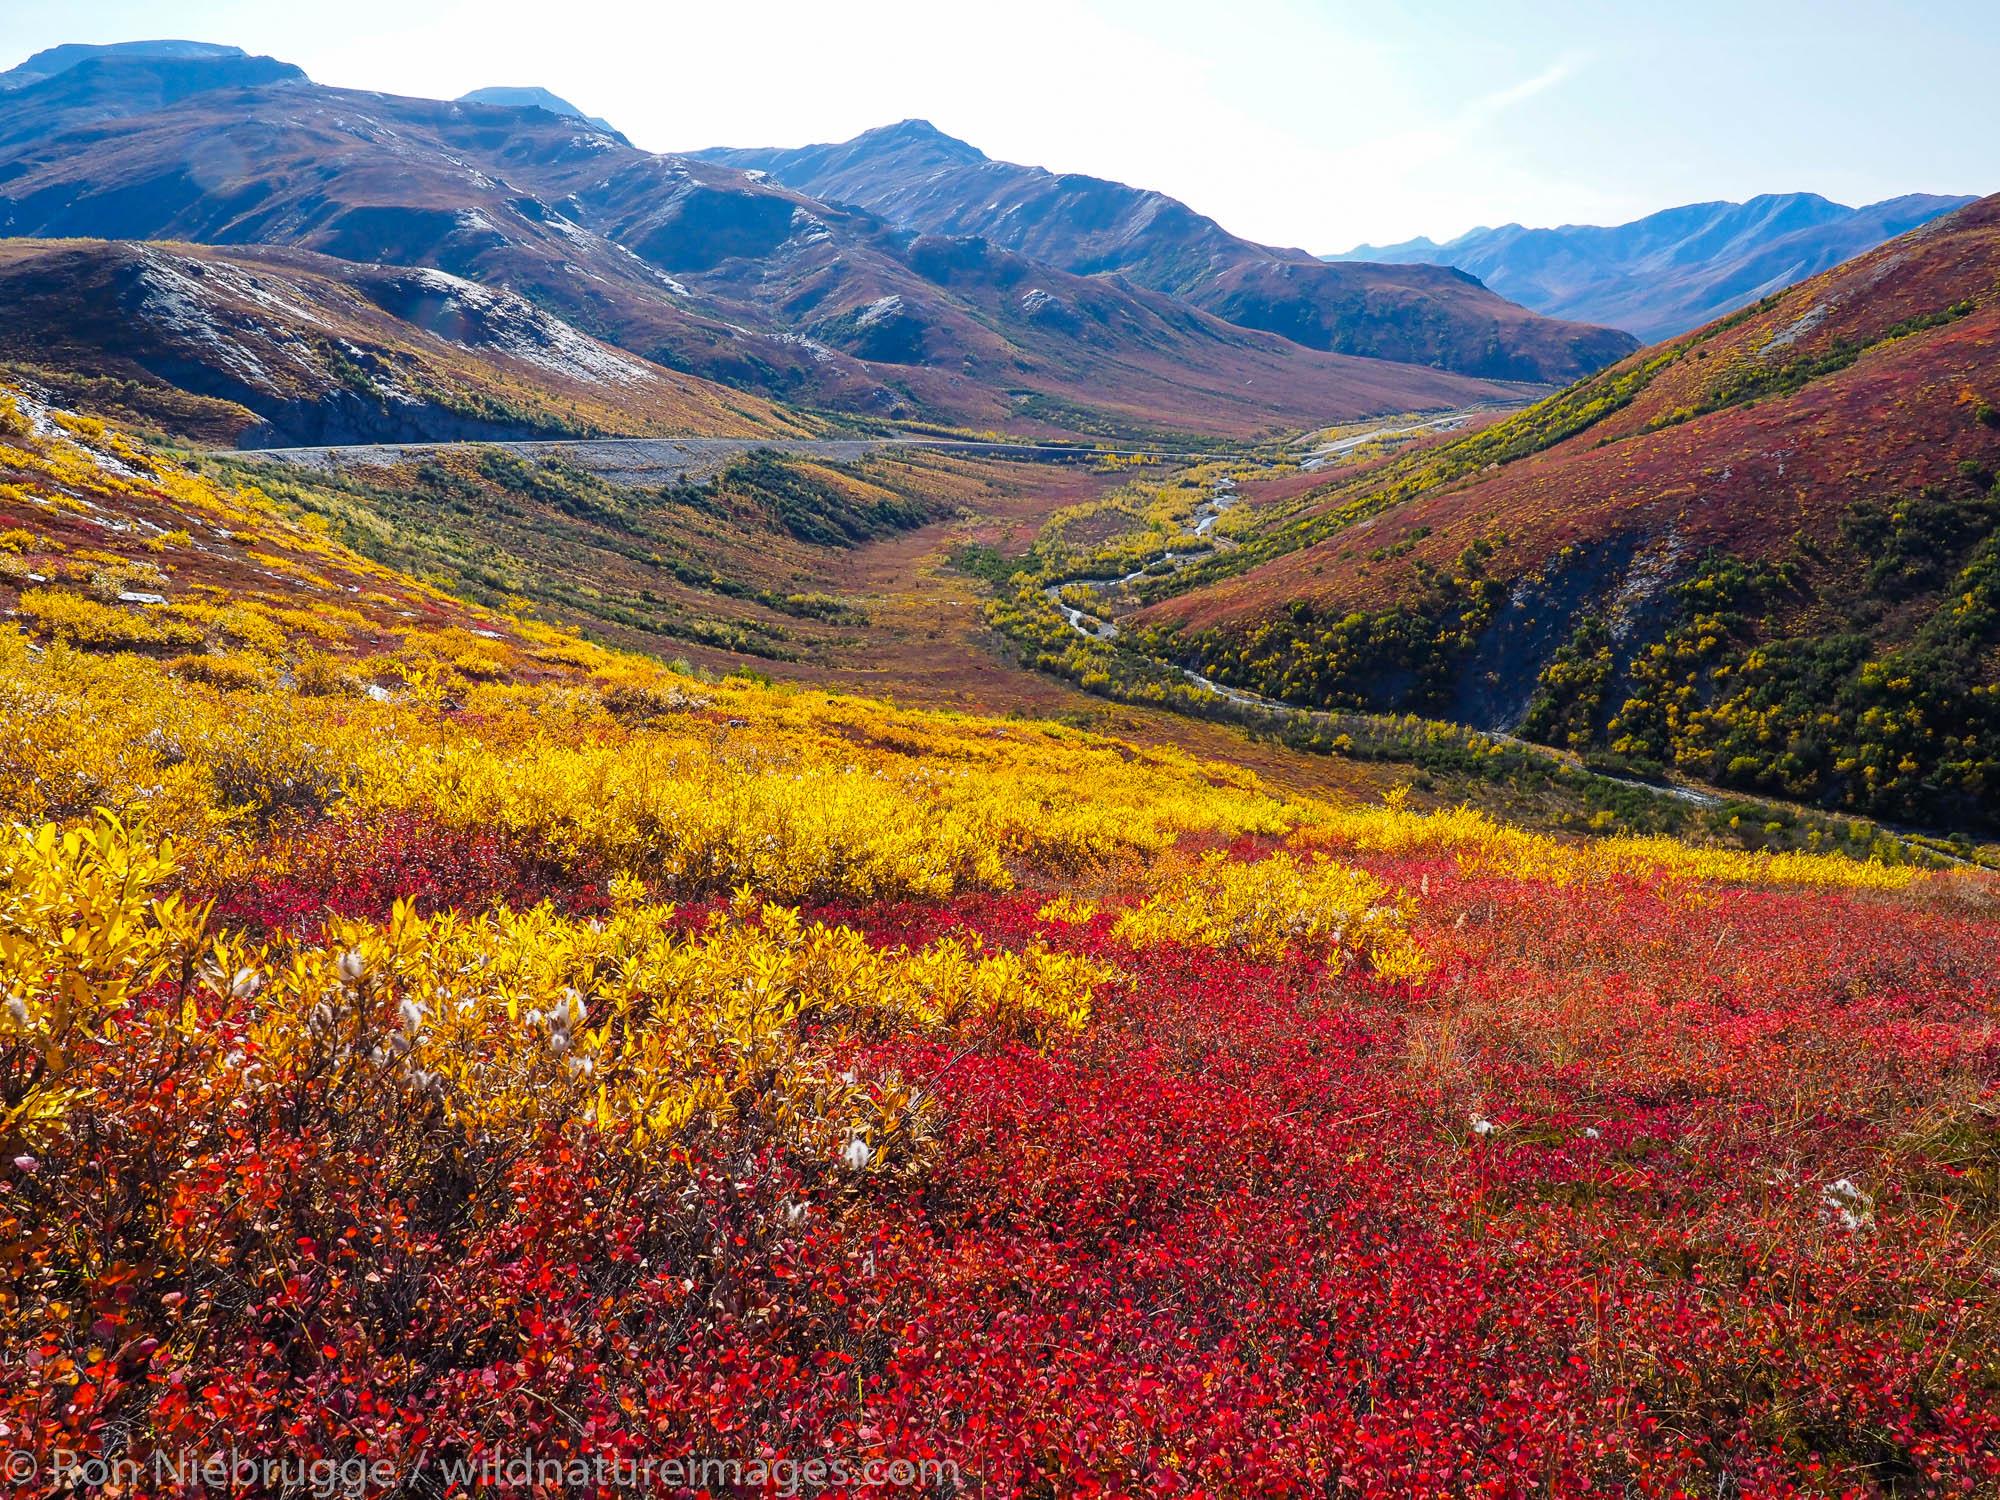 Autumn colors along the Dalton Highway, Brooks Range, Alaska.